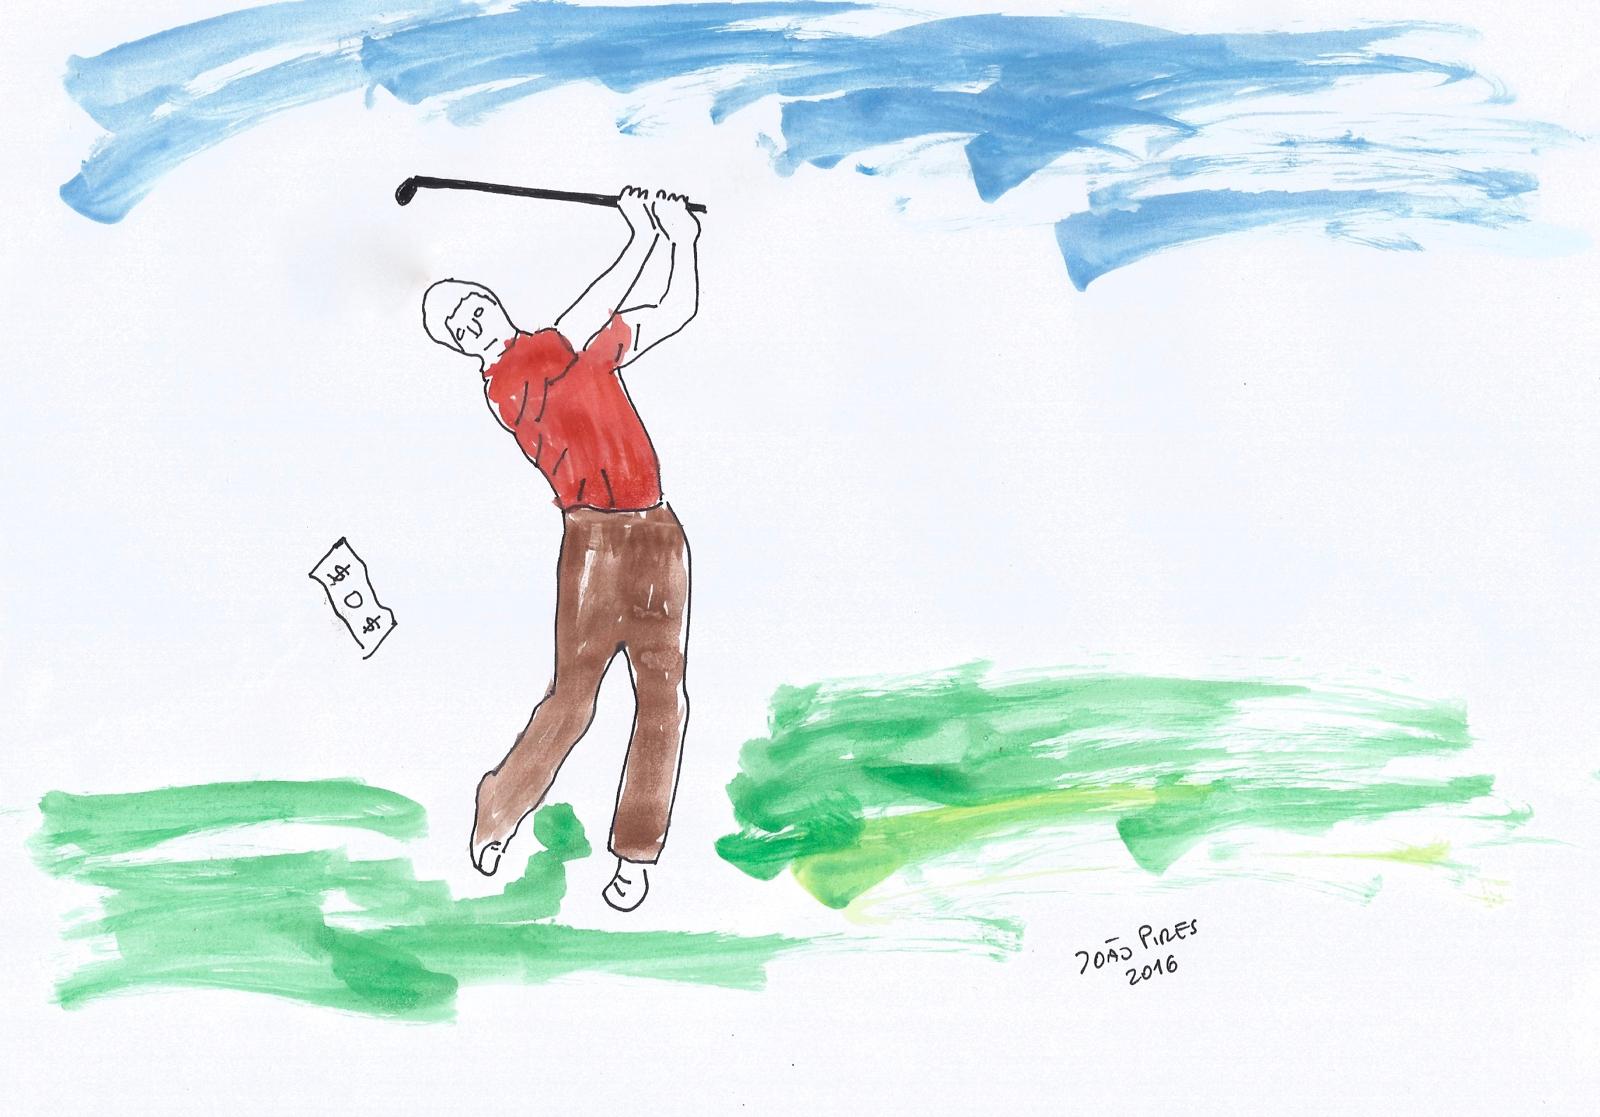 2016_algarve_golfe_tinta-permanente_desenho-aguarela_Joao-Pires .jpg